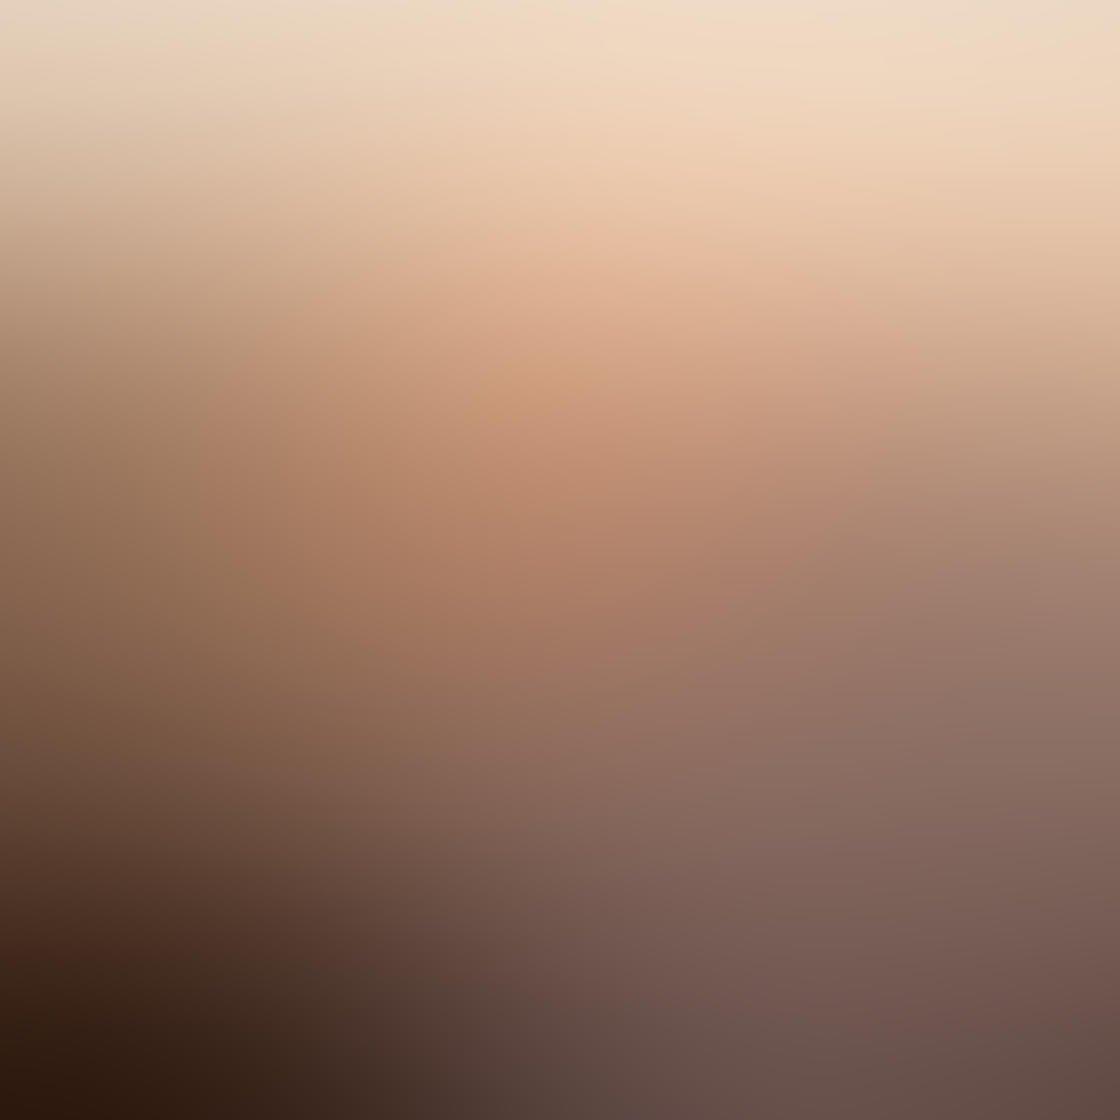 iPhone 8 Camera Filters